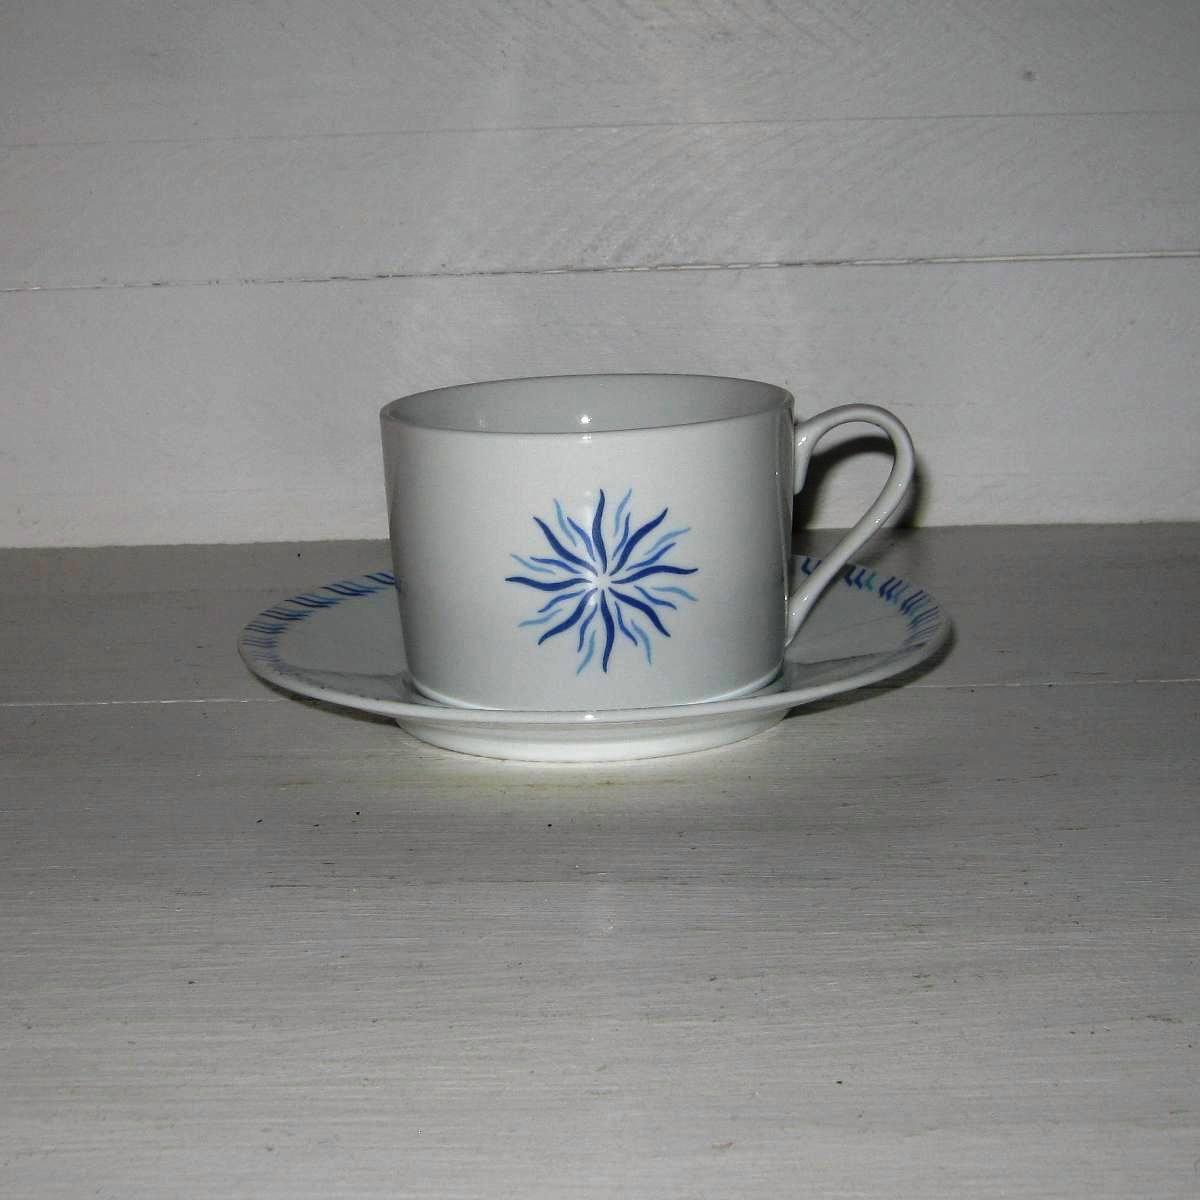 Tasse et sous tasse pierre balmain 1